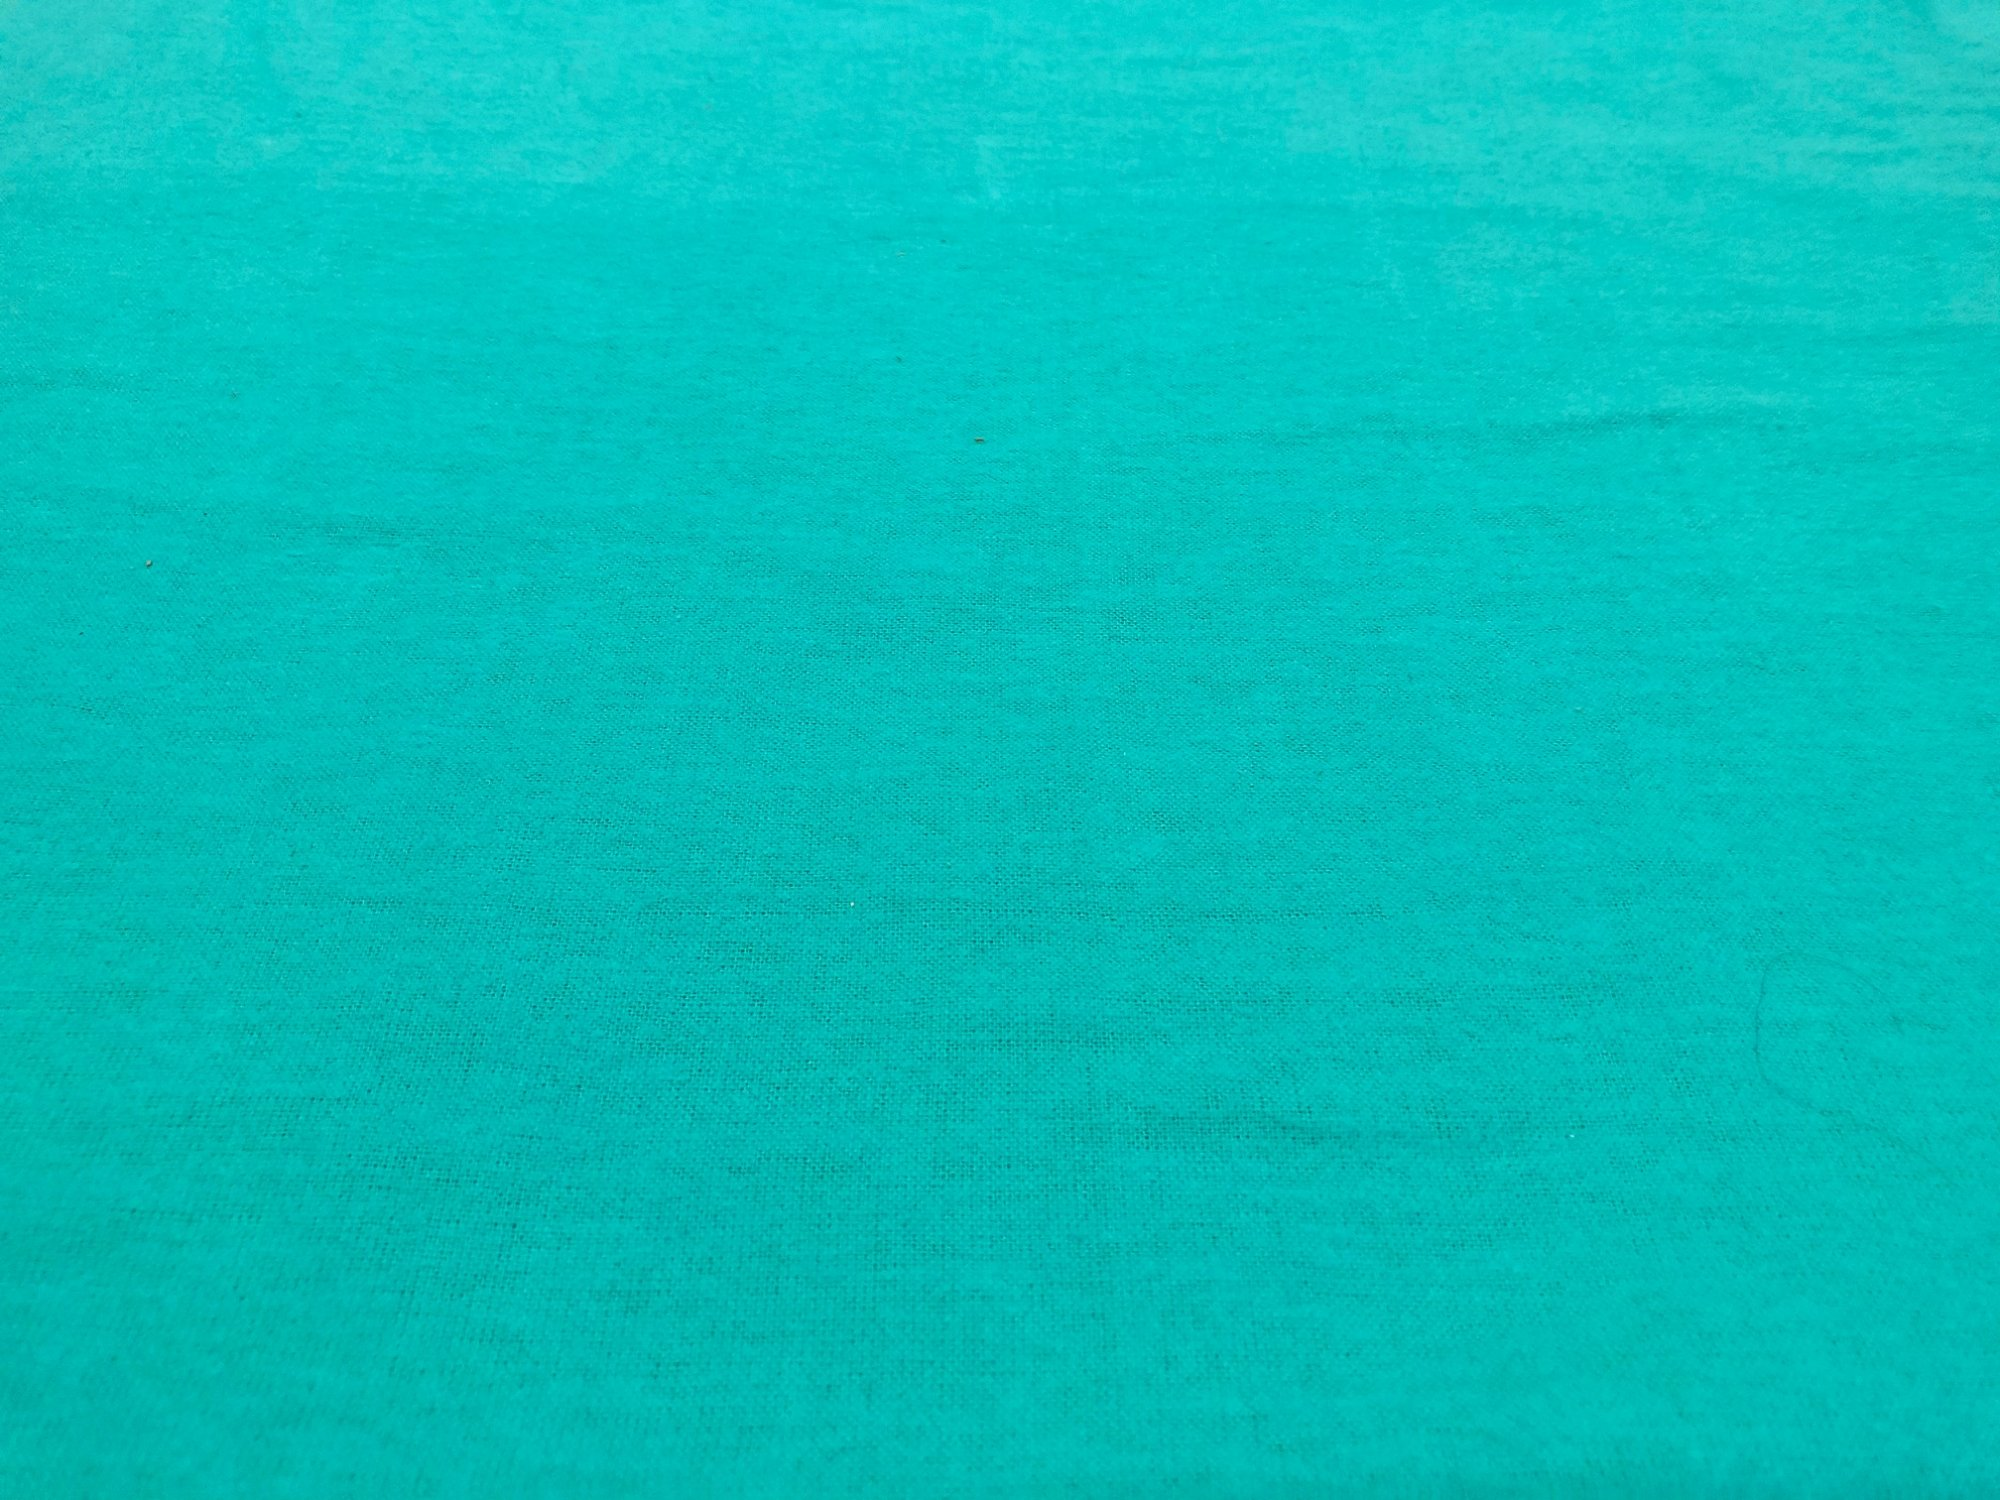 Basic Flannel - Teal